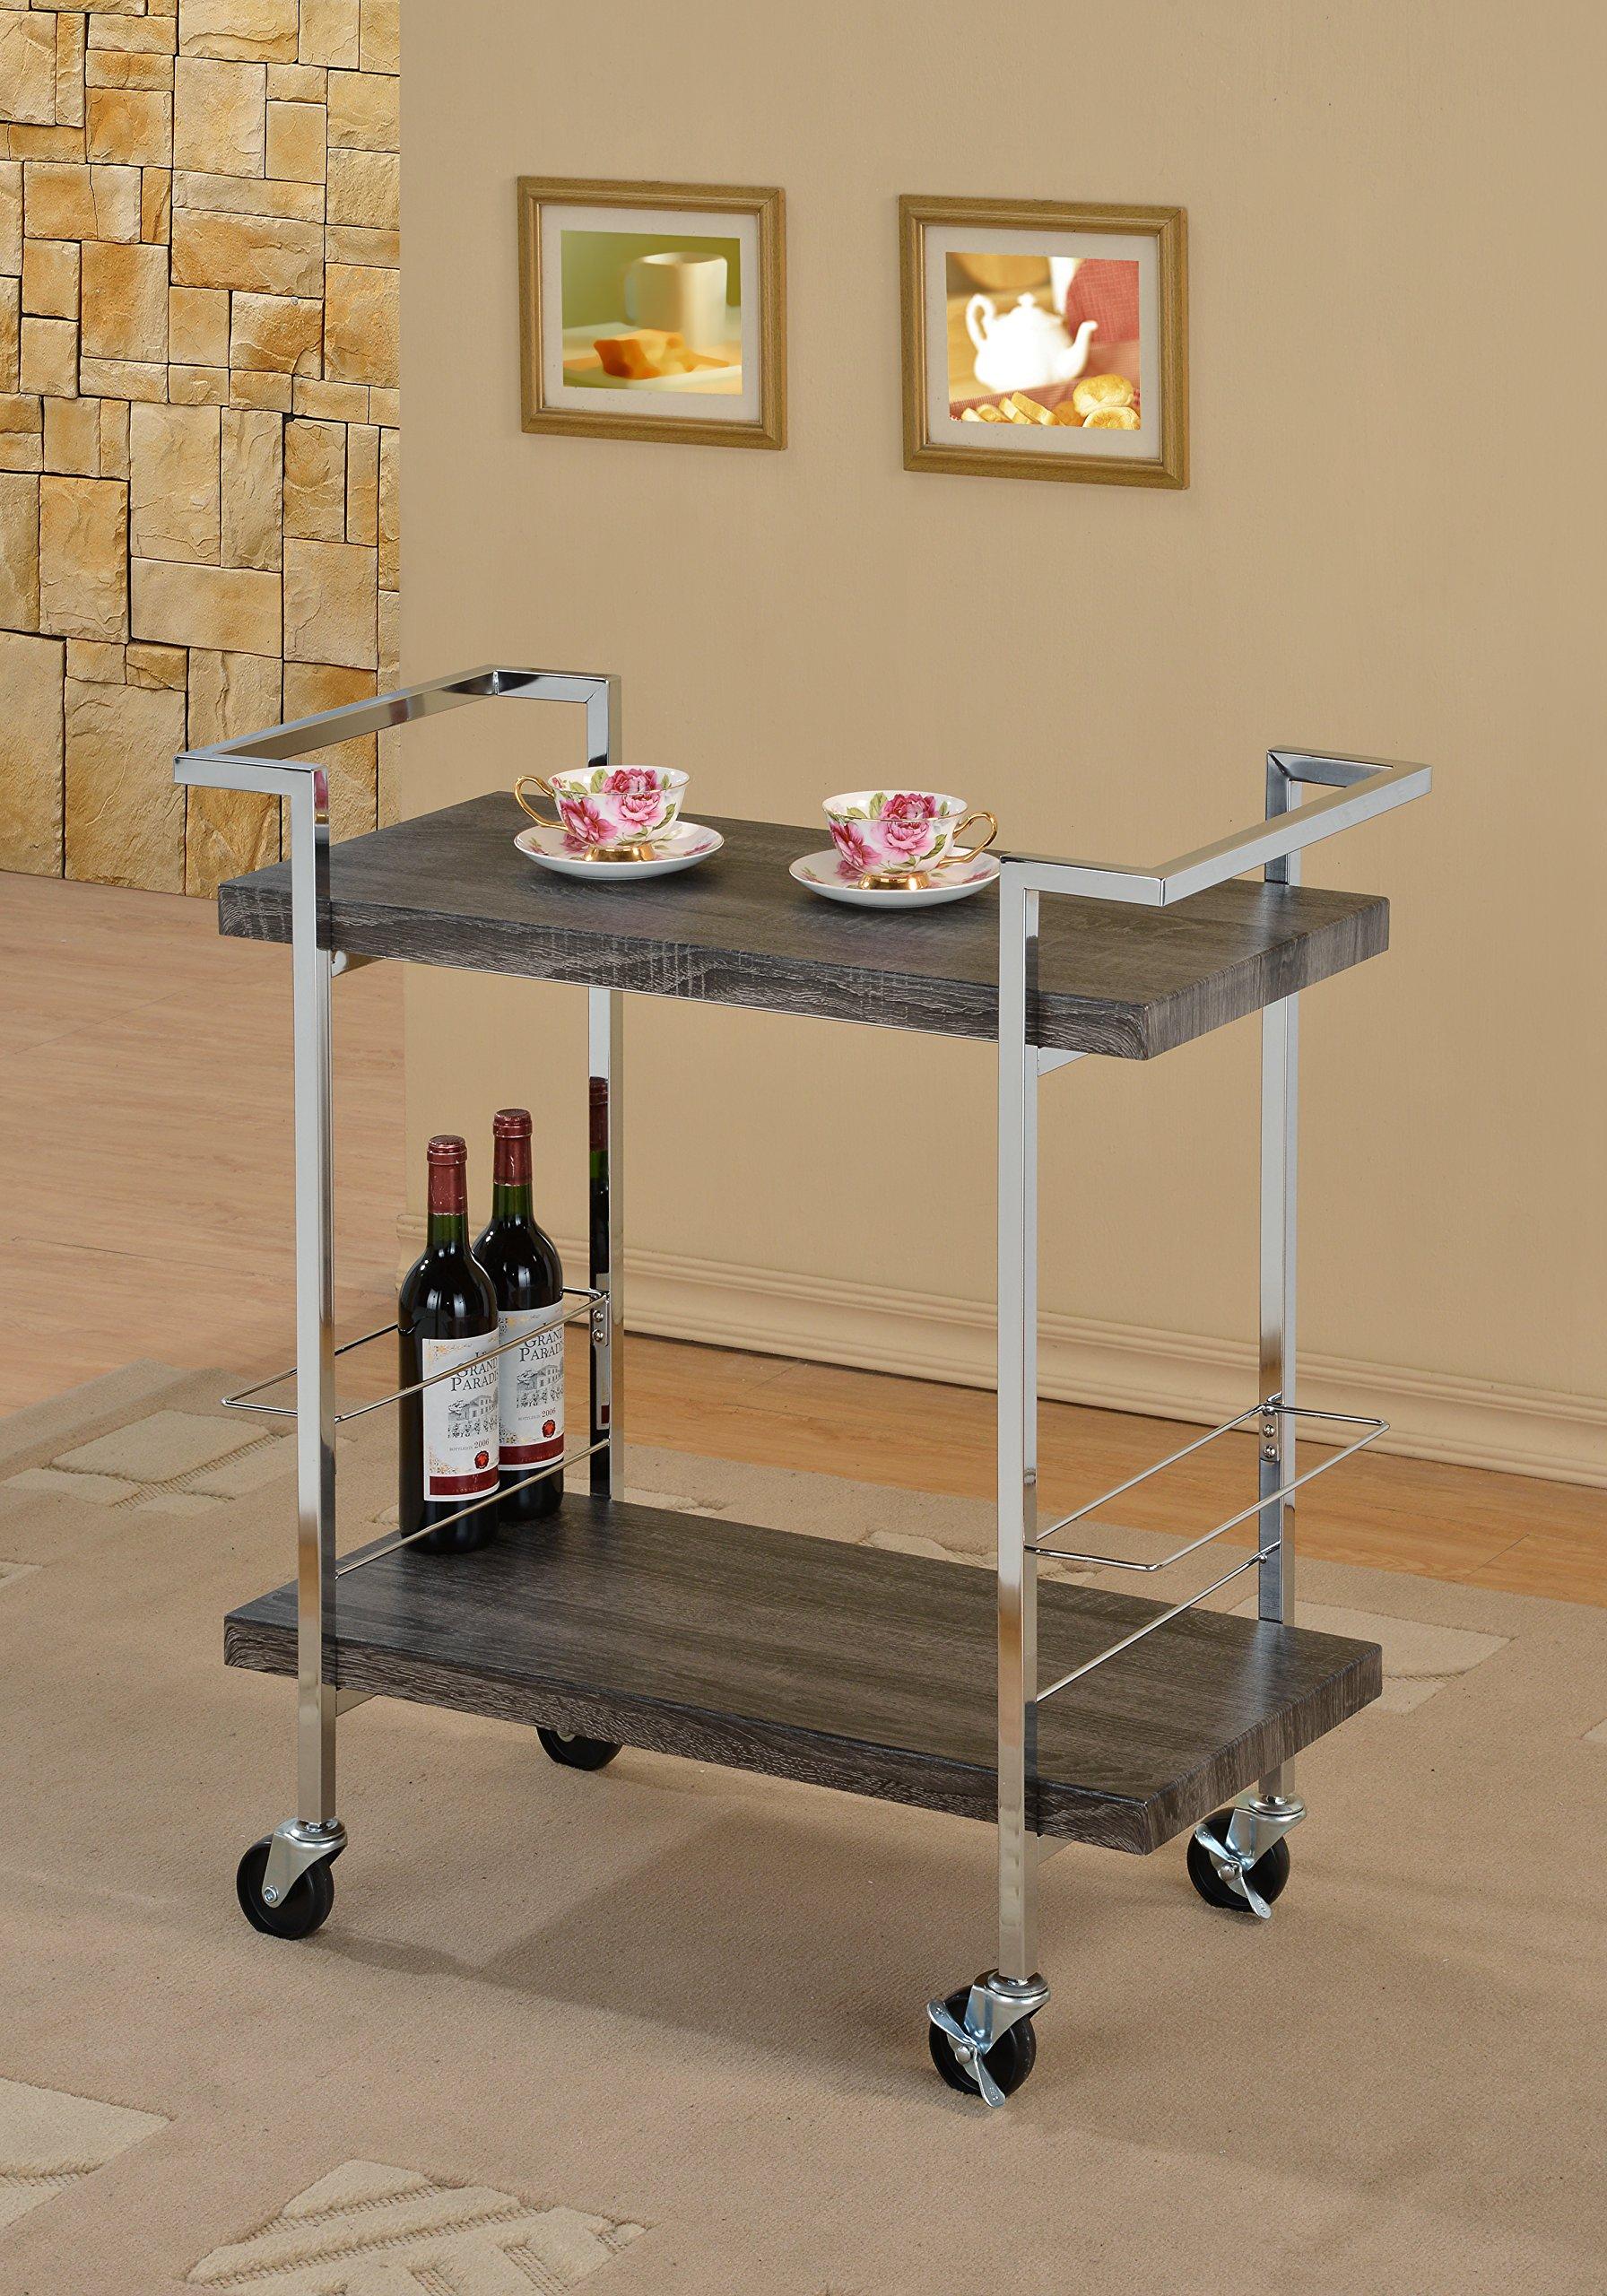 Weathered Grey Wood Look Chrome Metal Bar Tea Wine Holder Serving Cart